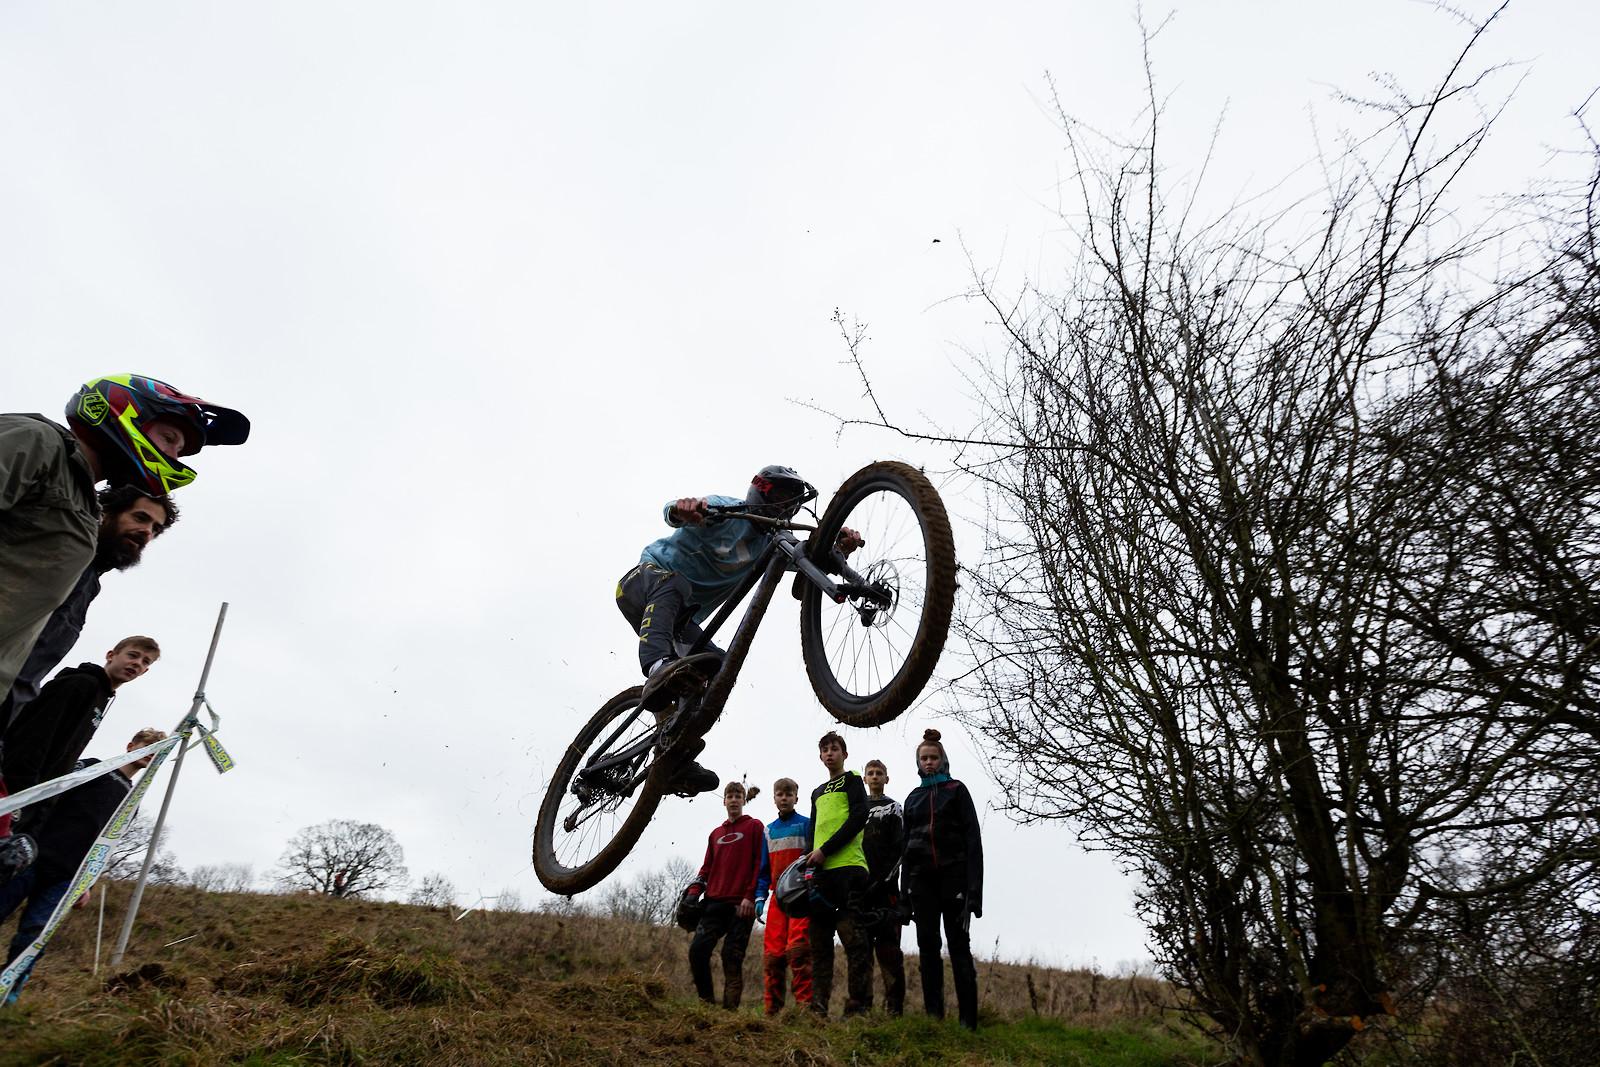 Long Jump Challenge - Dadcamtv - Mountain Biking Pictures - Vital MTB